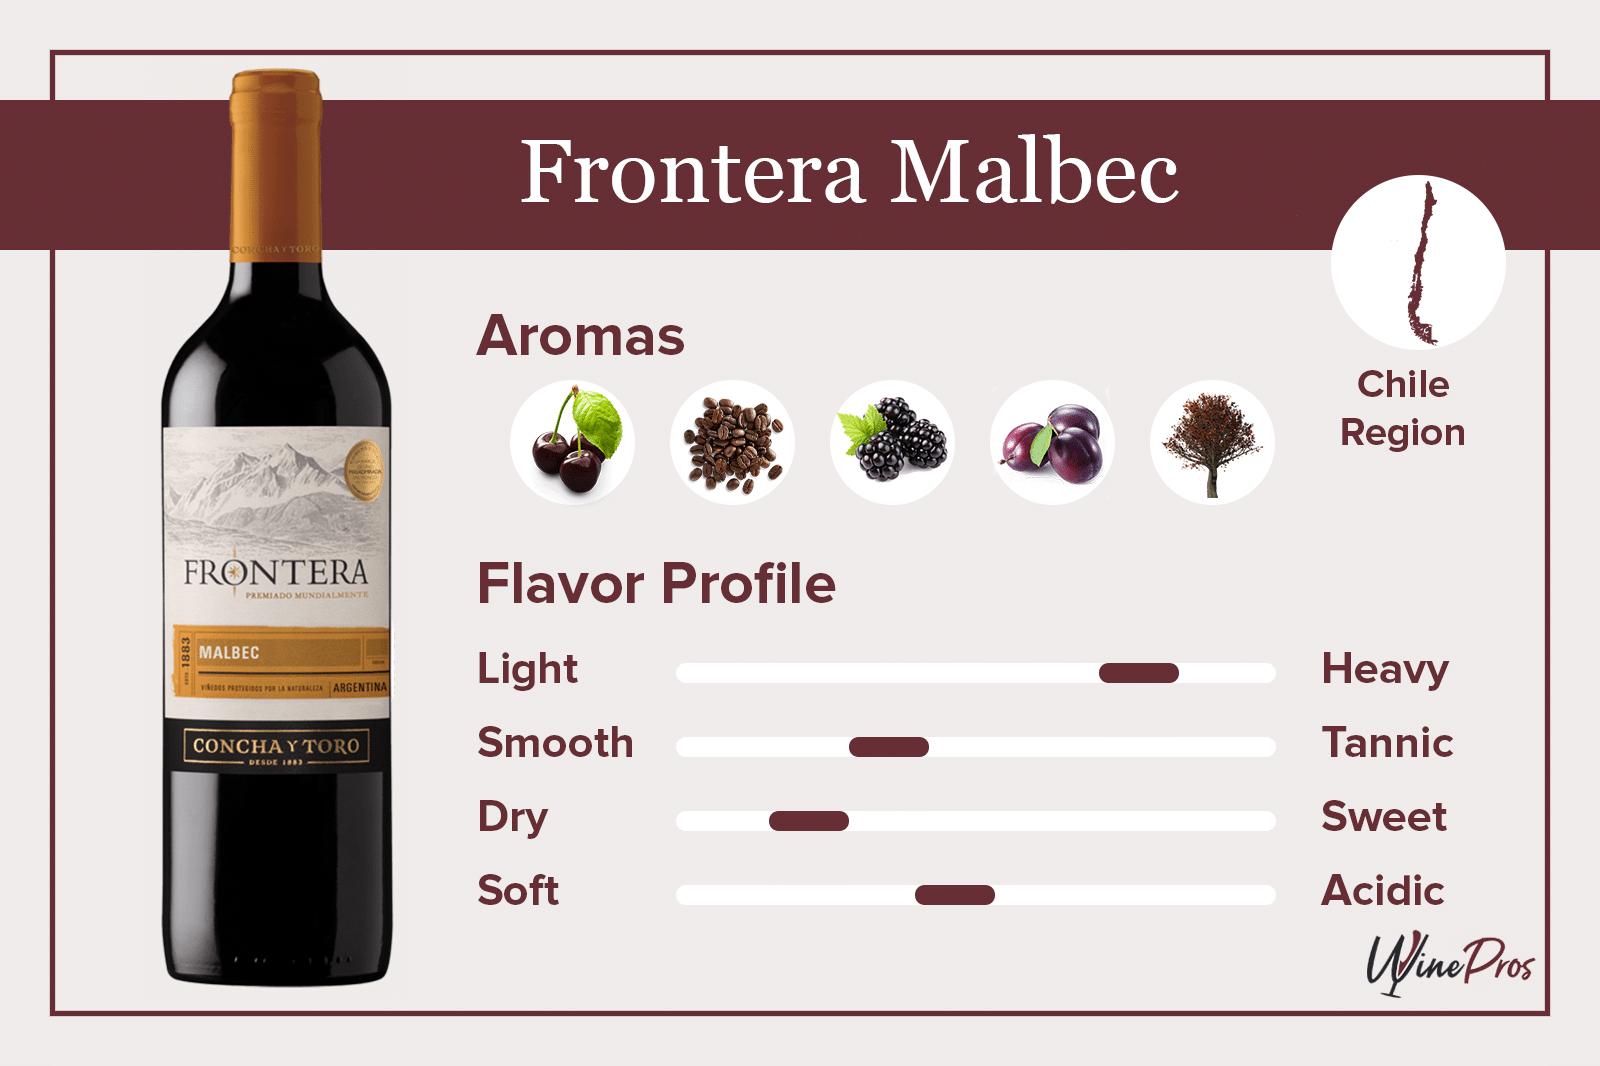 Frontera Malbec Featured